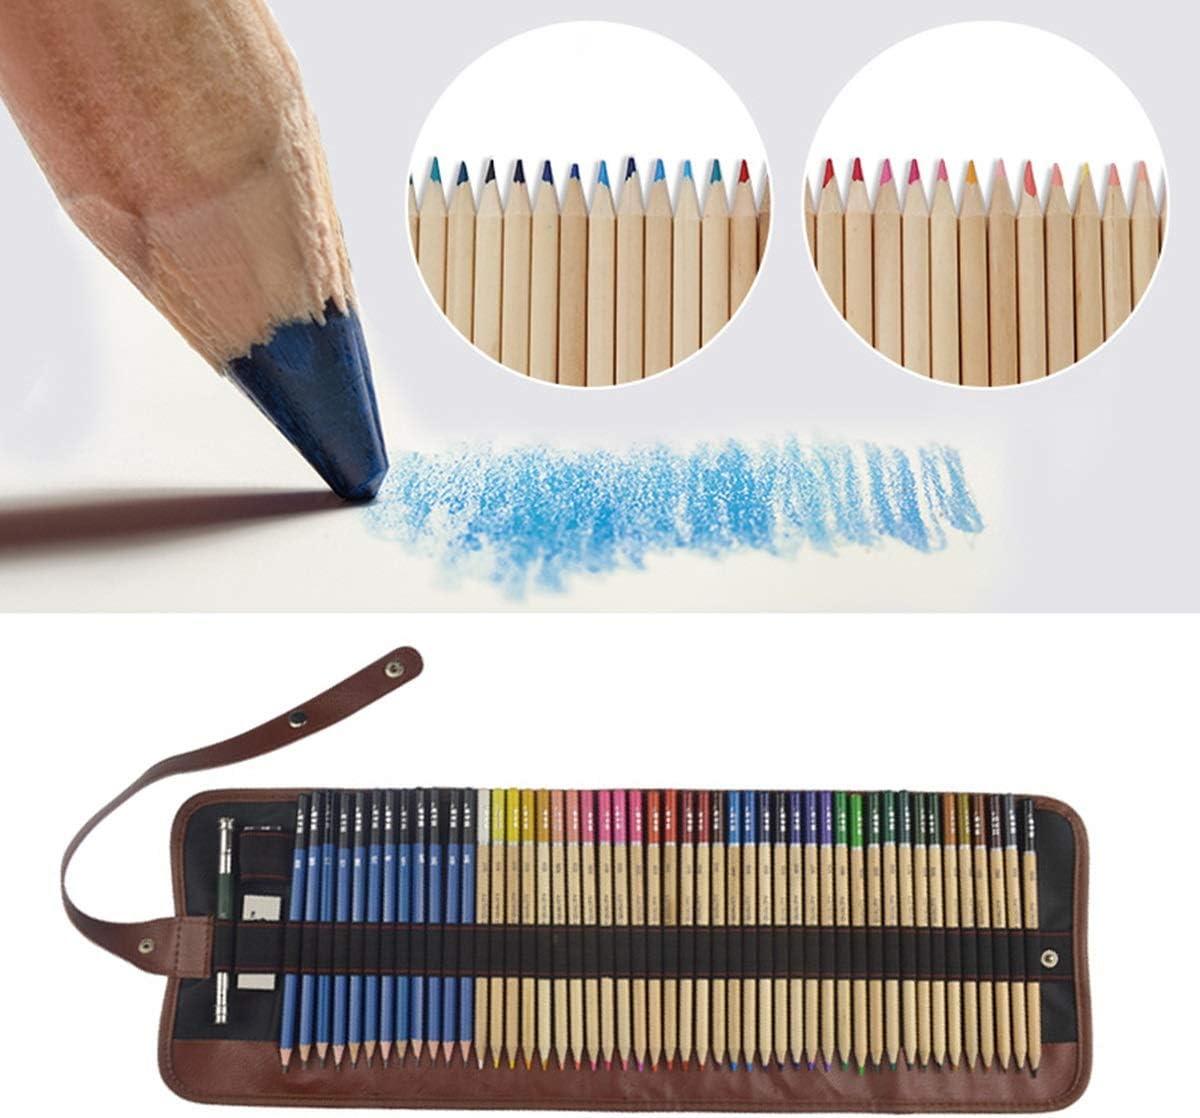 36 Colors DEALPEAK 52Pcs//Set Colored Pencils Art Drawing Coloring Sketch Pencil Kit with Sharpener Coloring Supplies